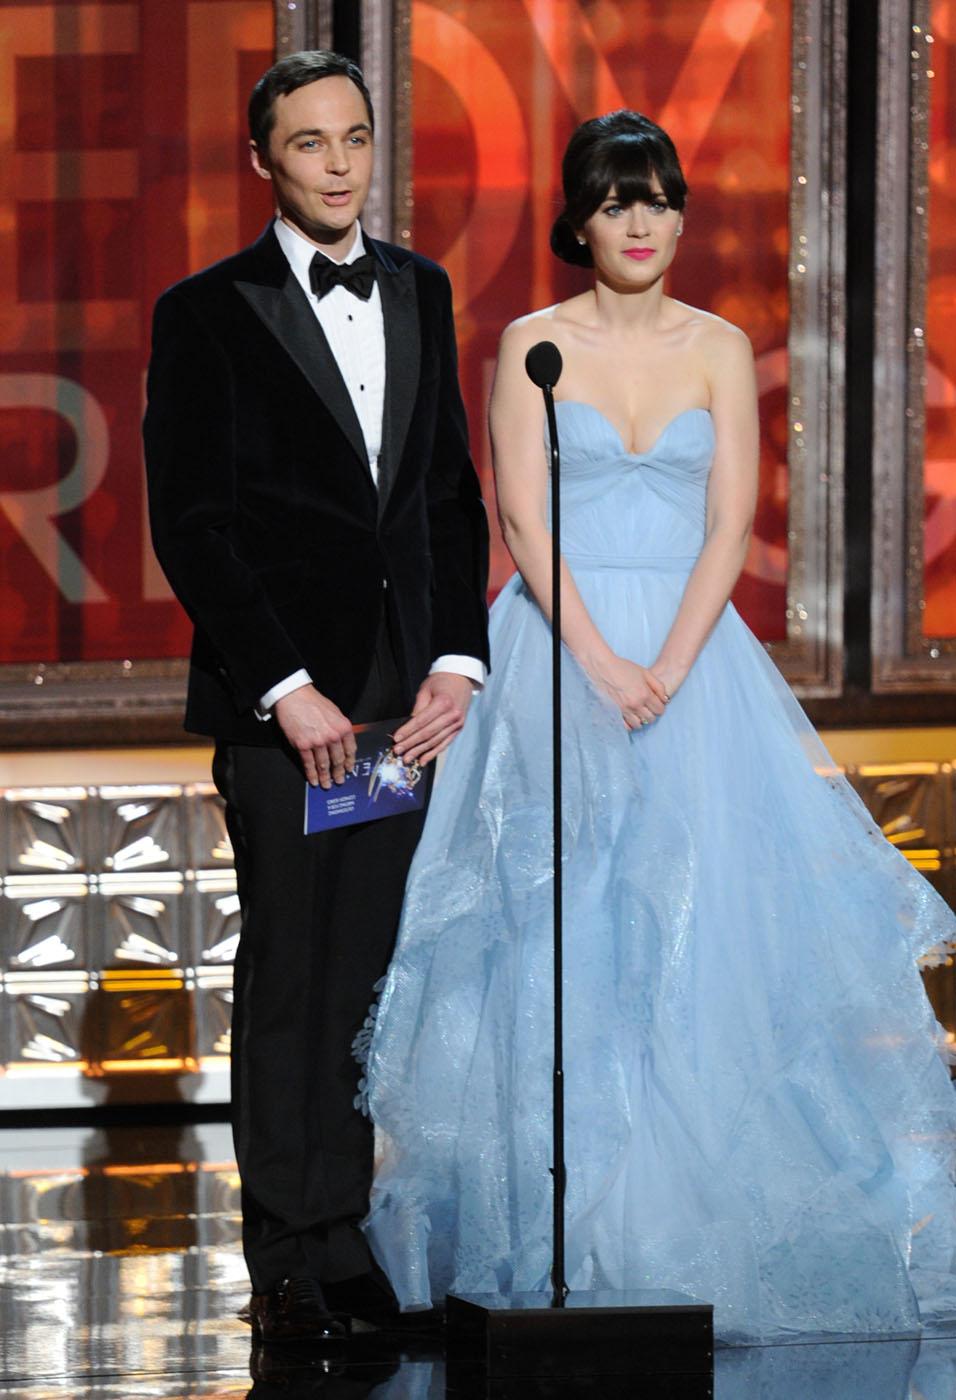 Zoey Deschanel - 2012 Emmy Awards, Red Carpet Looks